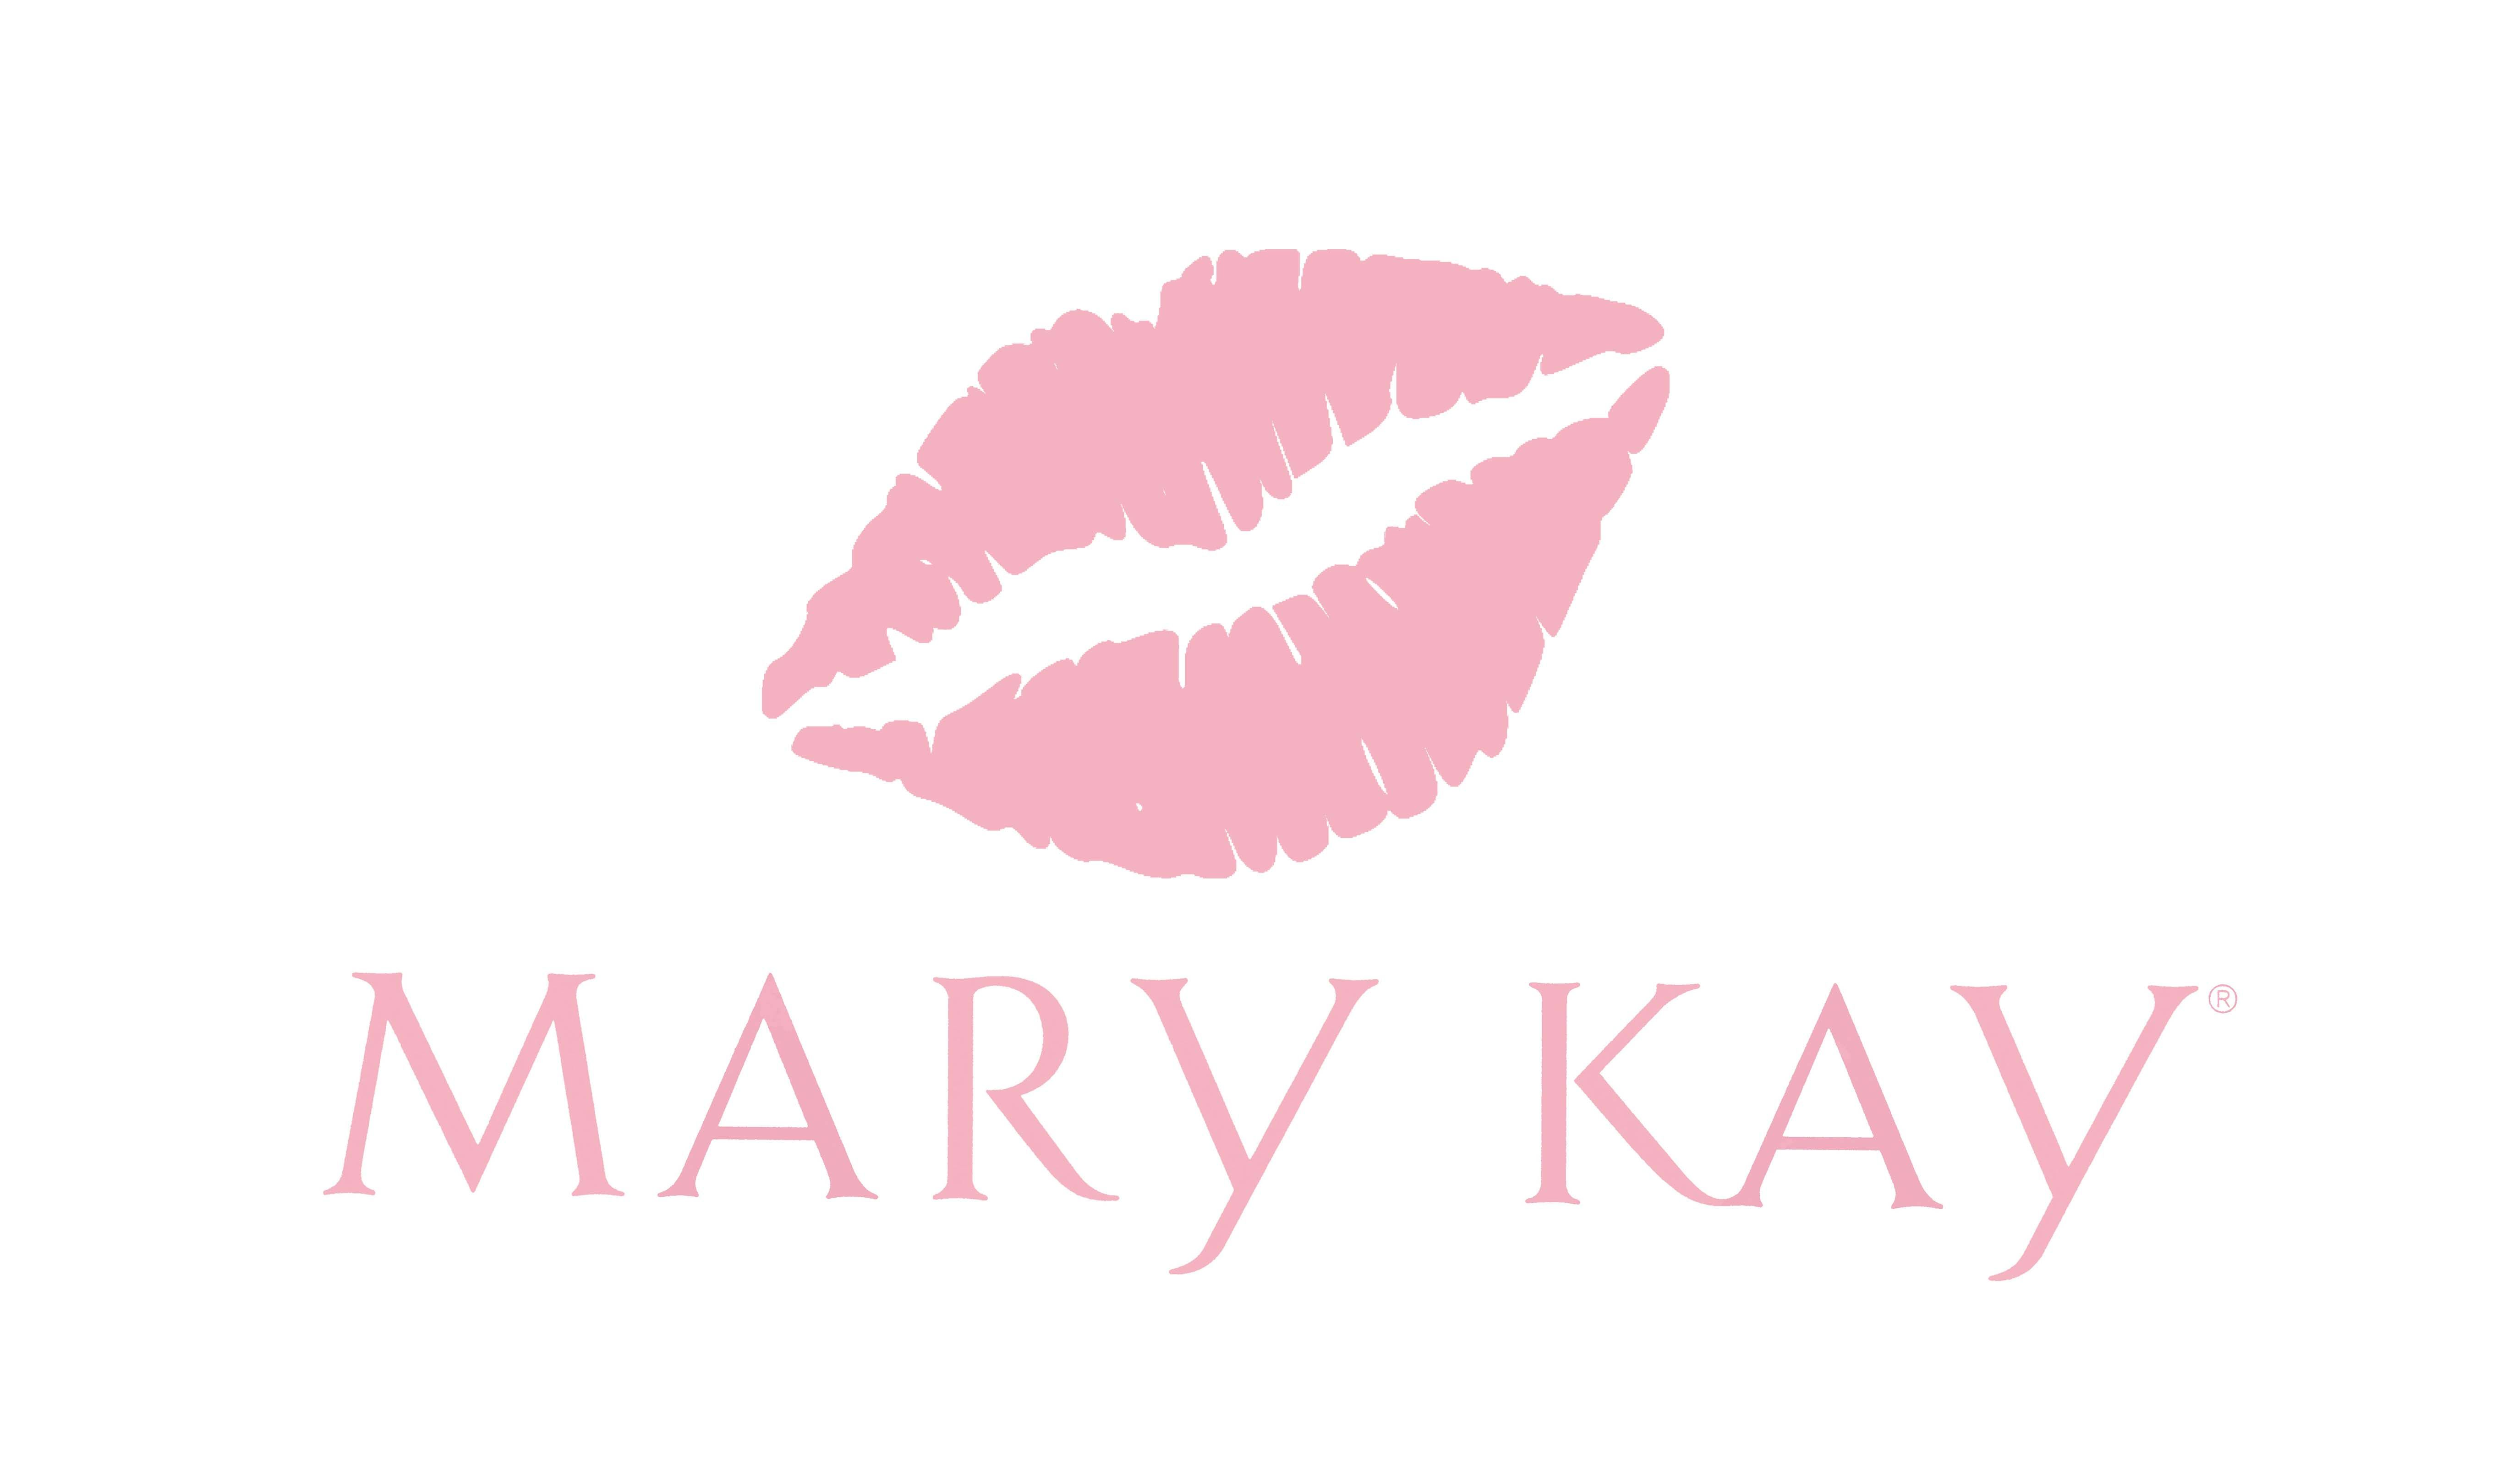 Mk logo Mary kay, Mary kay logo, Mary kay pink